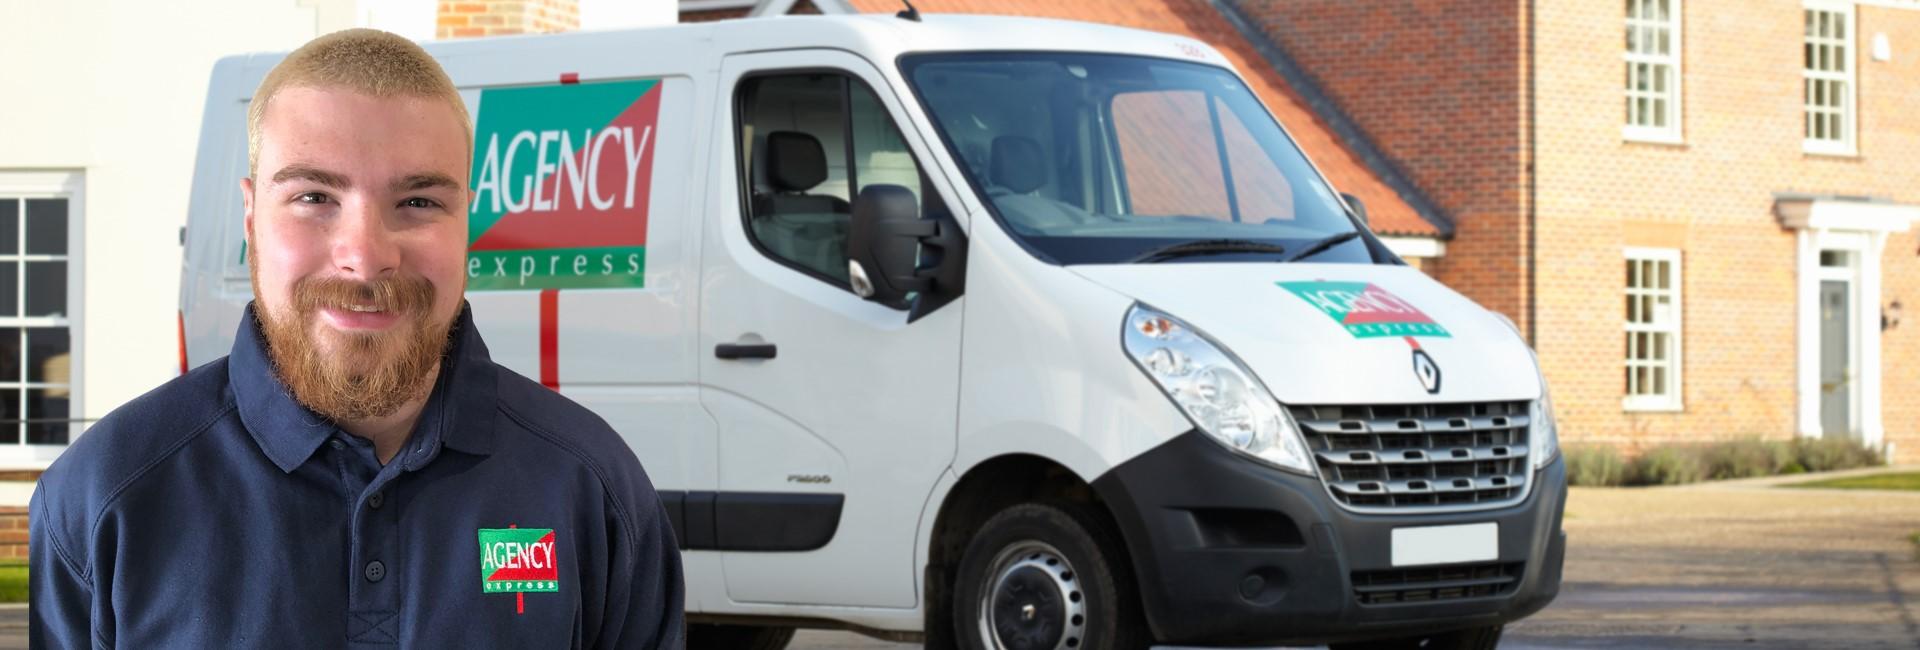 Agency Express case study. Franchisee Riccardo Mudrak with van.